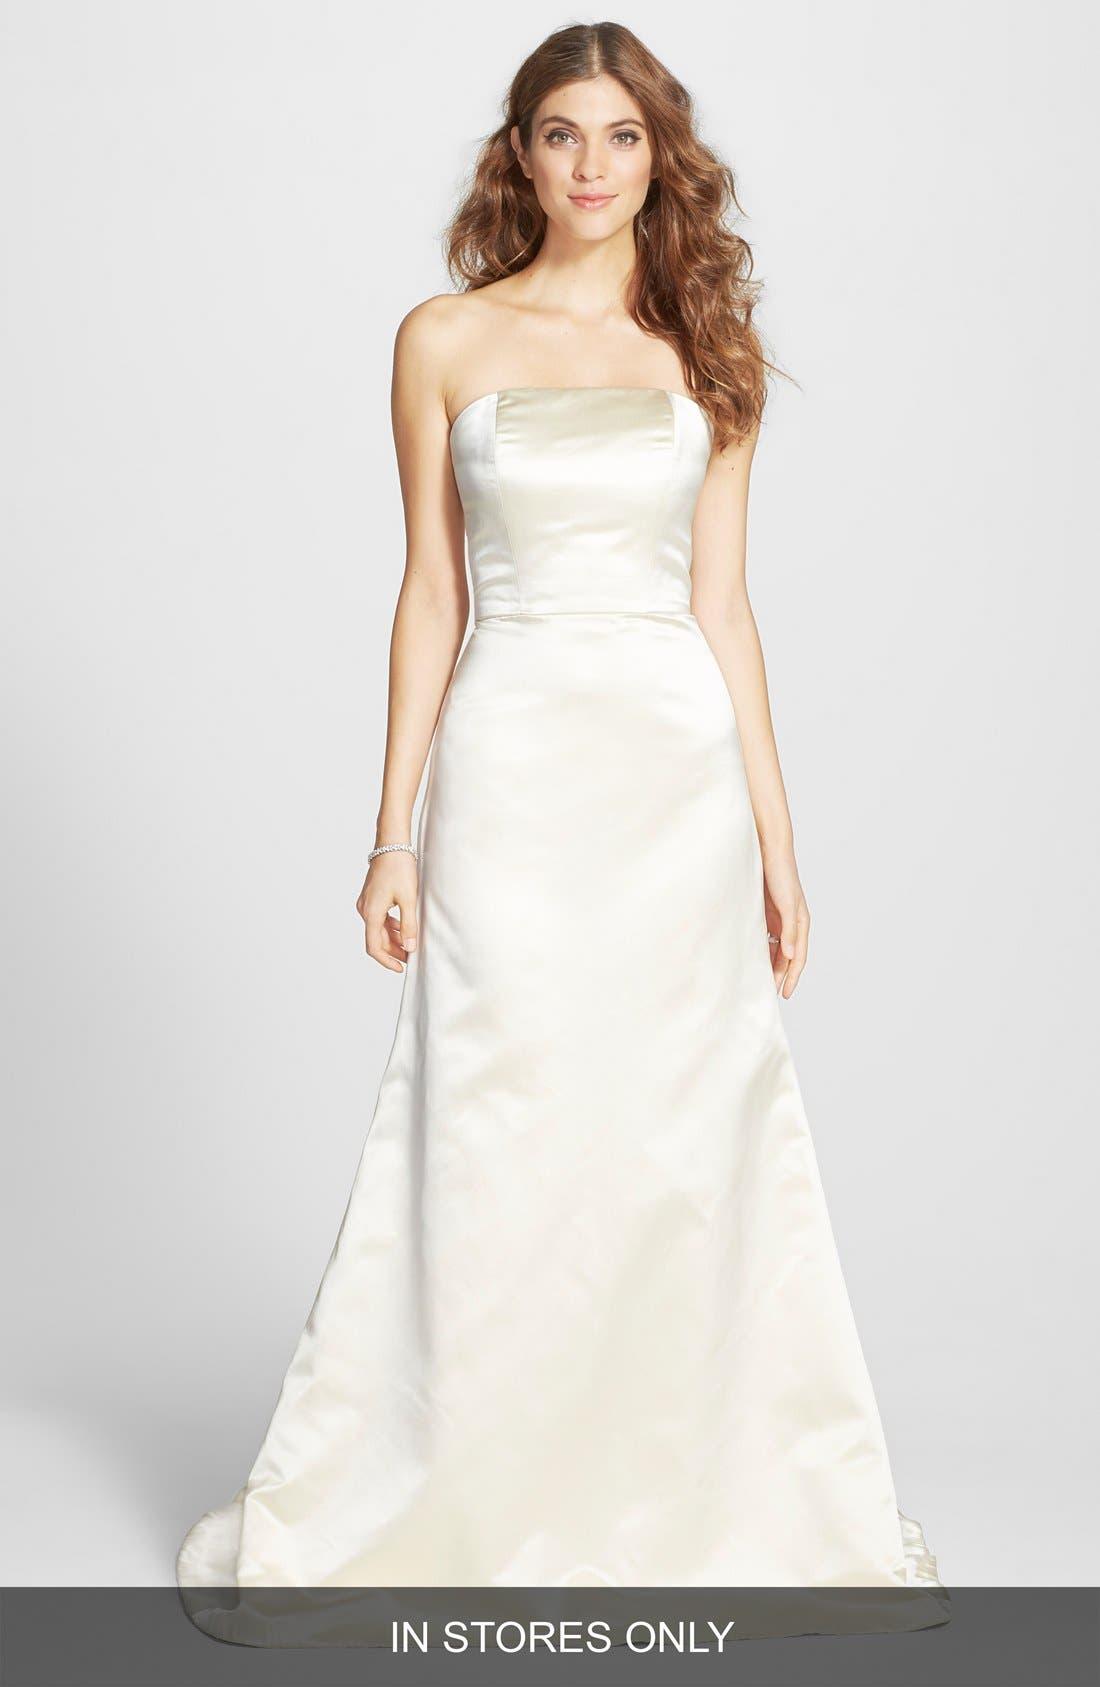 CAROLINE DEVILLO 'Grace' Silk Satin Fluted Dress